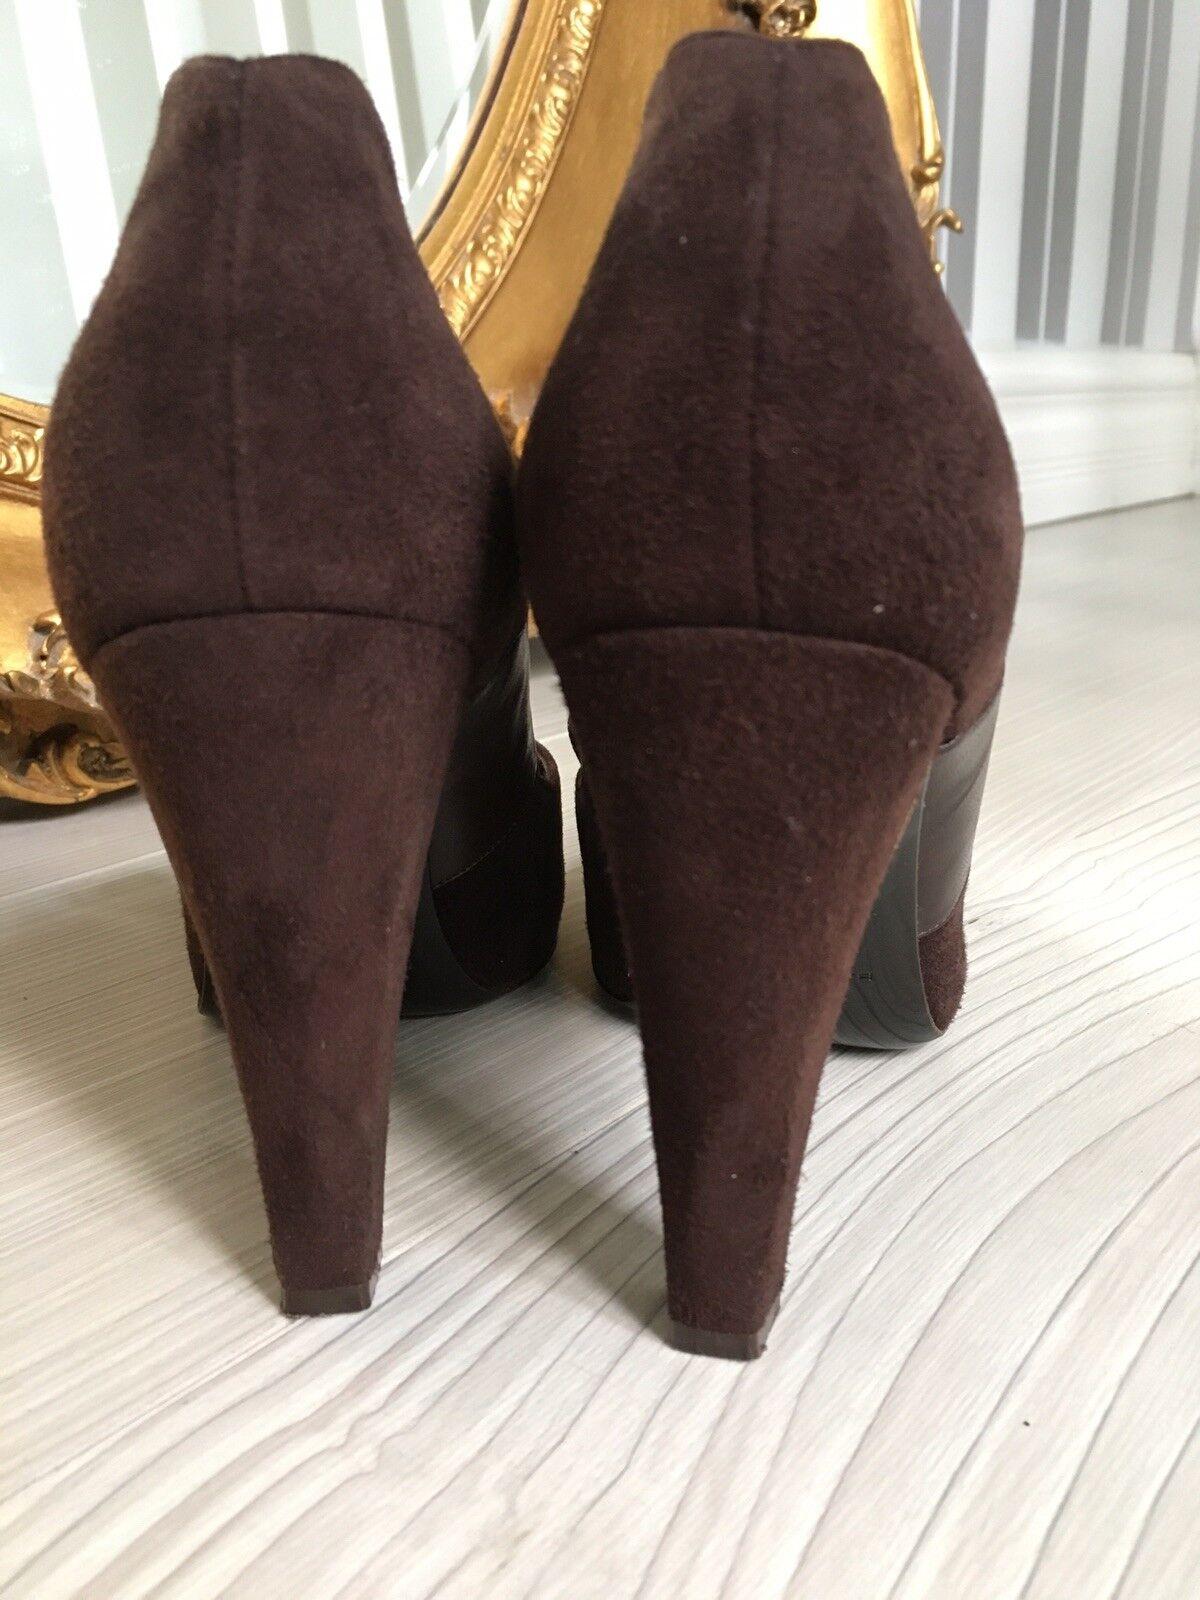 Balenciaga Balenciaga Balenciaga Brown Suede High Heels 3ab295